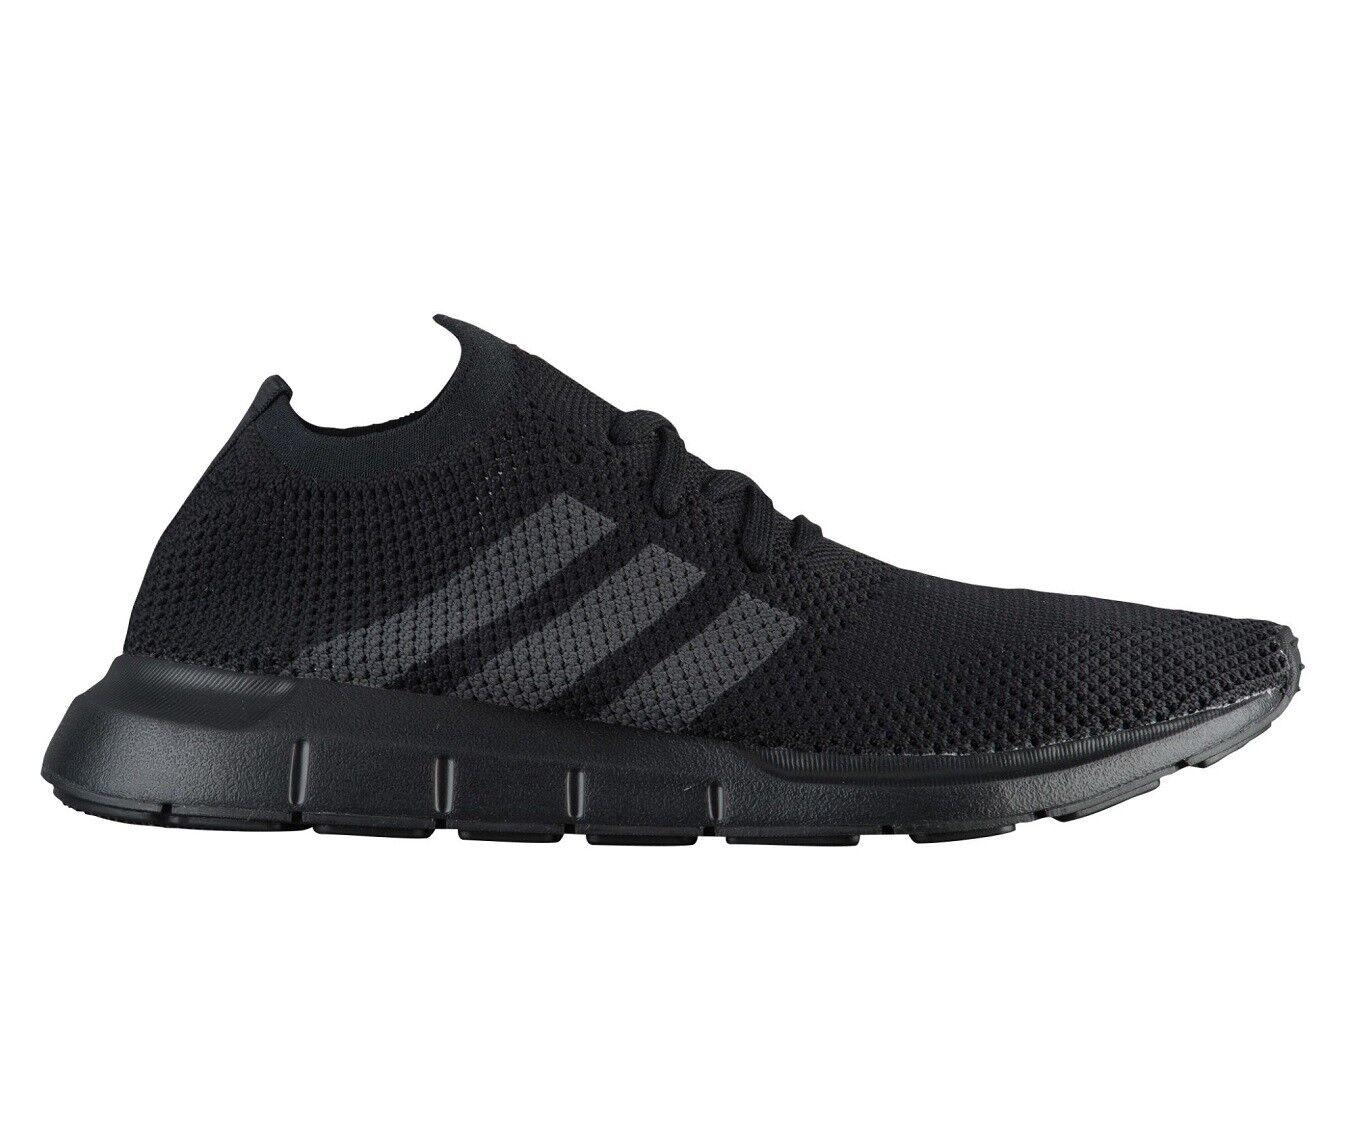 Adidas Swift Run PK Mens CQ2893 Black Grey Primeknit Running shoes Size 10.5